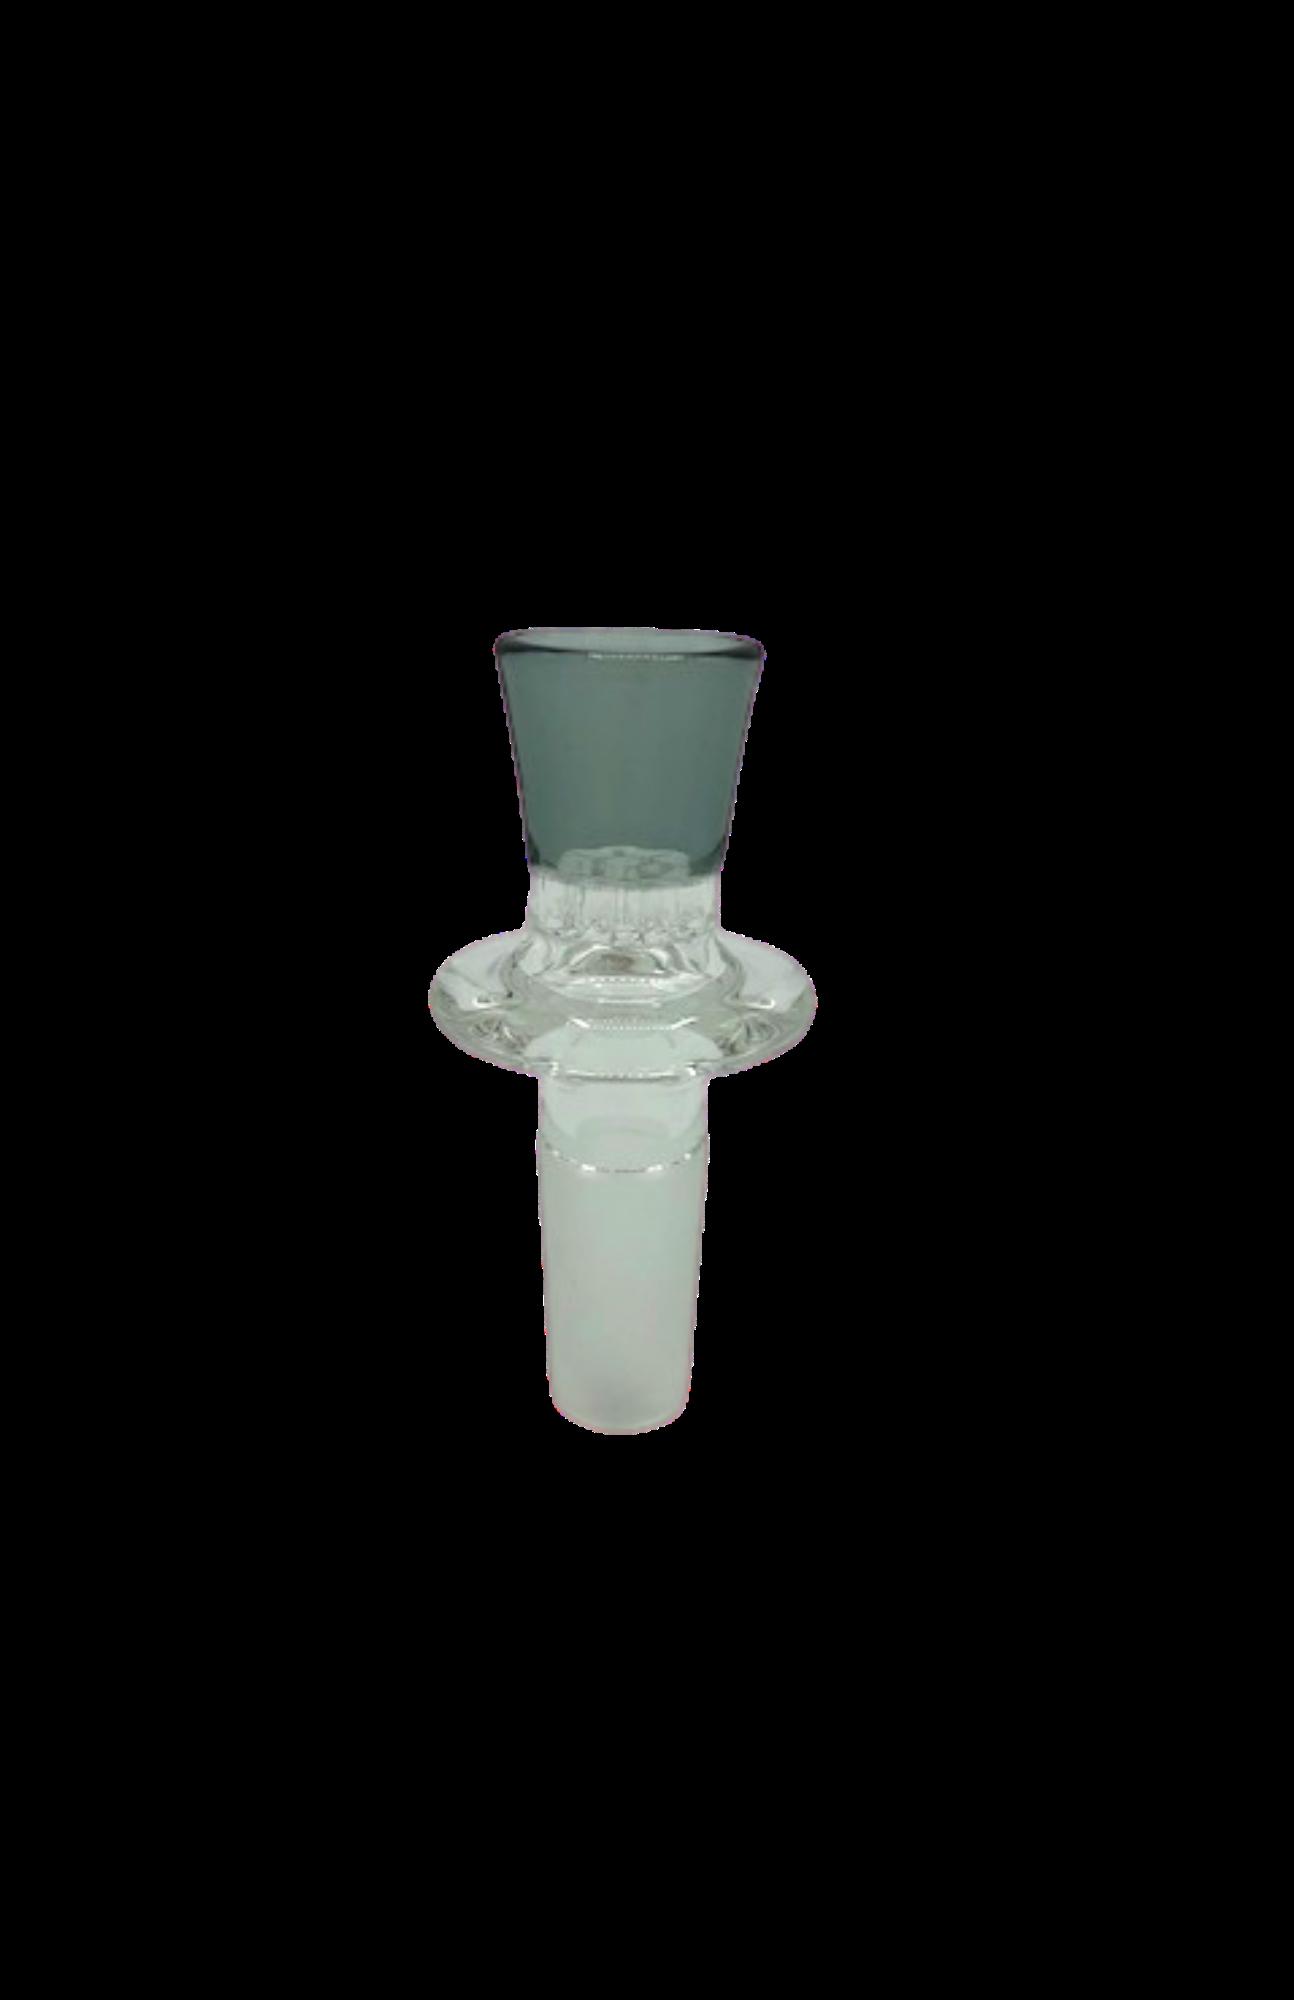 BBG Male 19mm Smoke Honeycomb Gong Slide